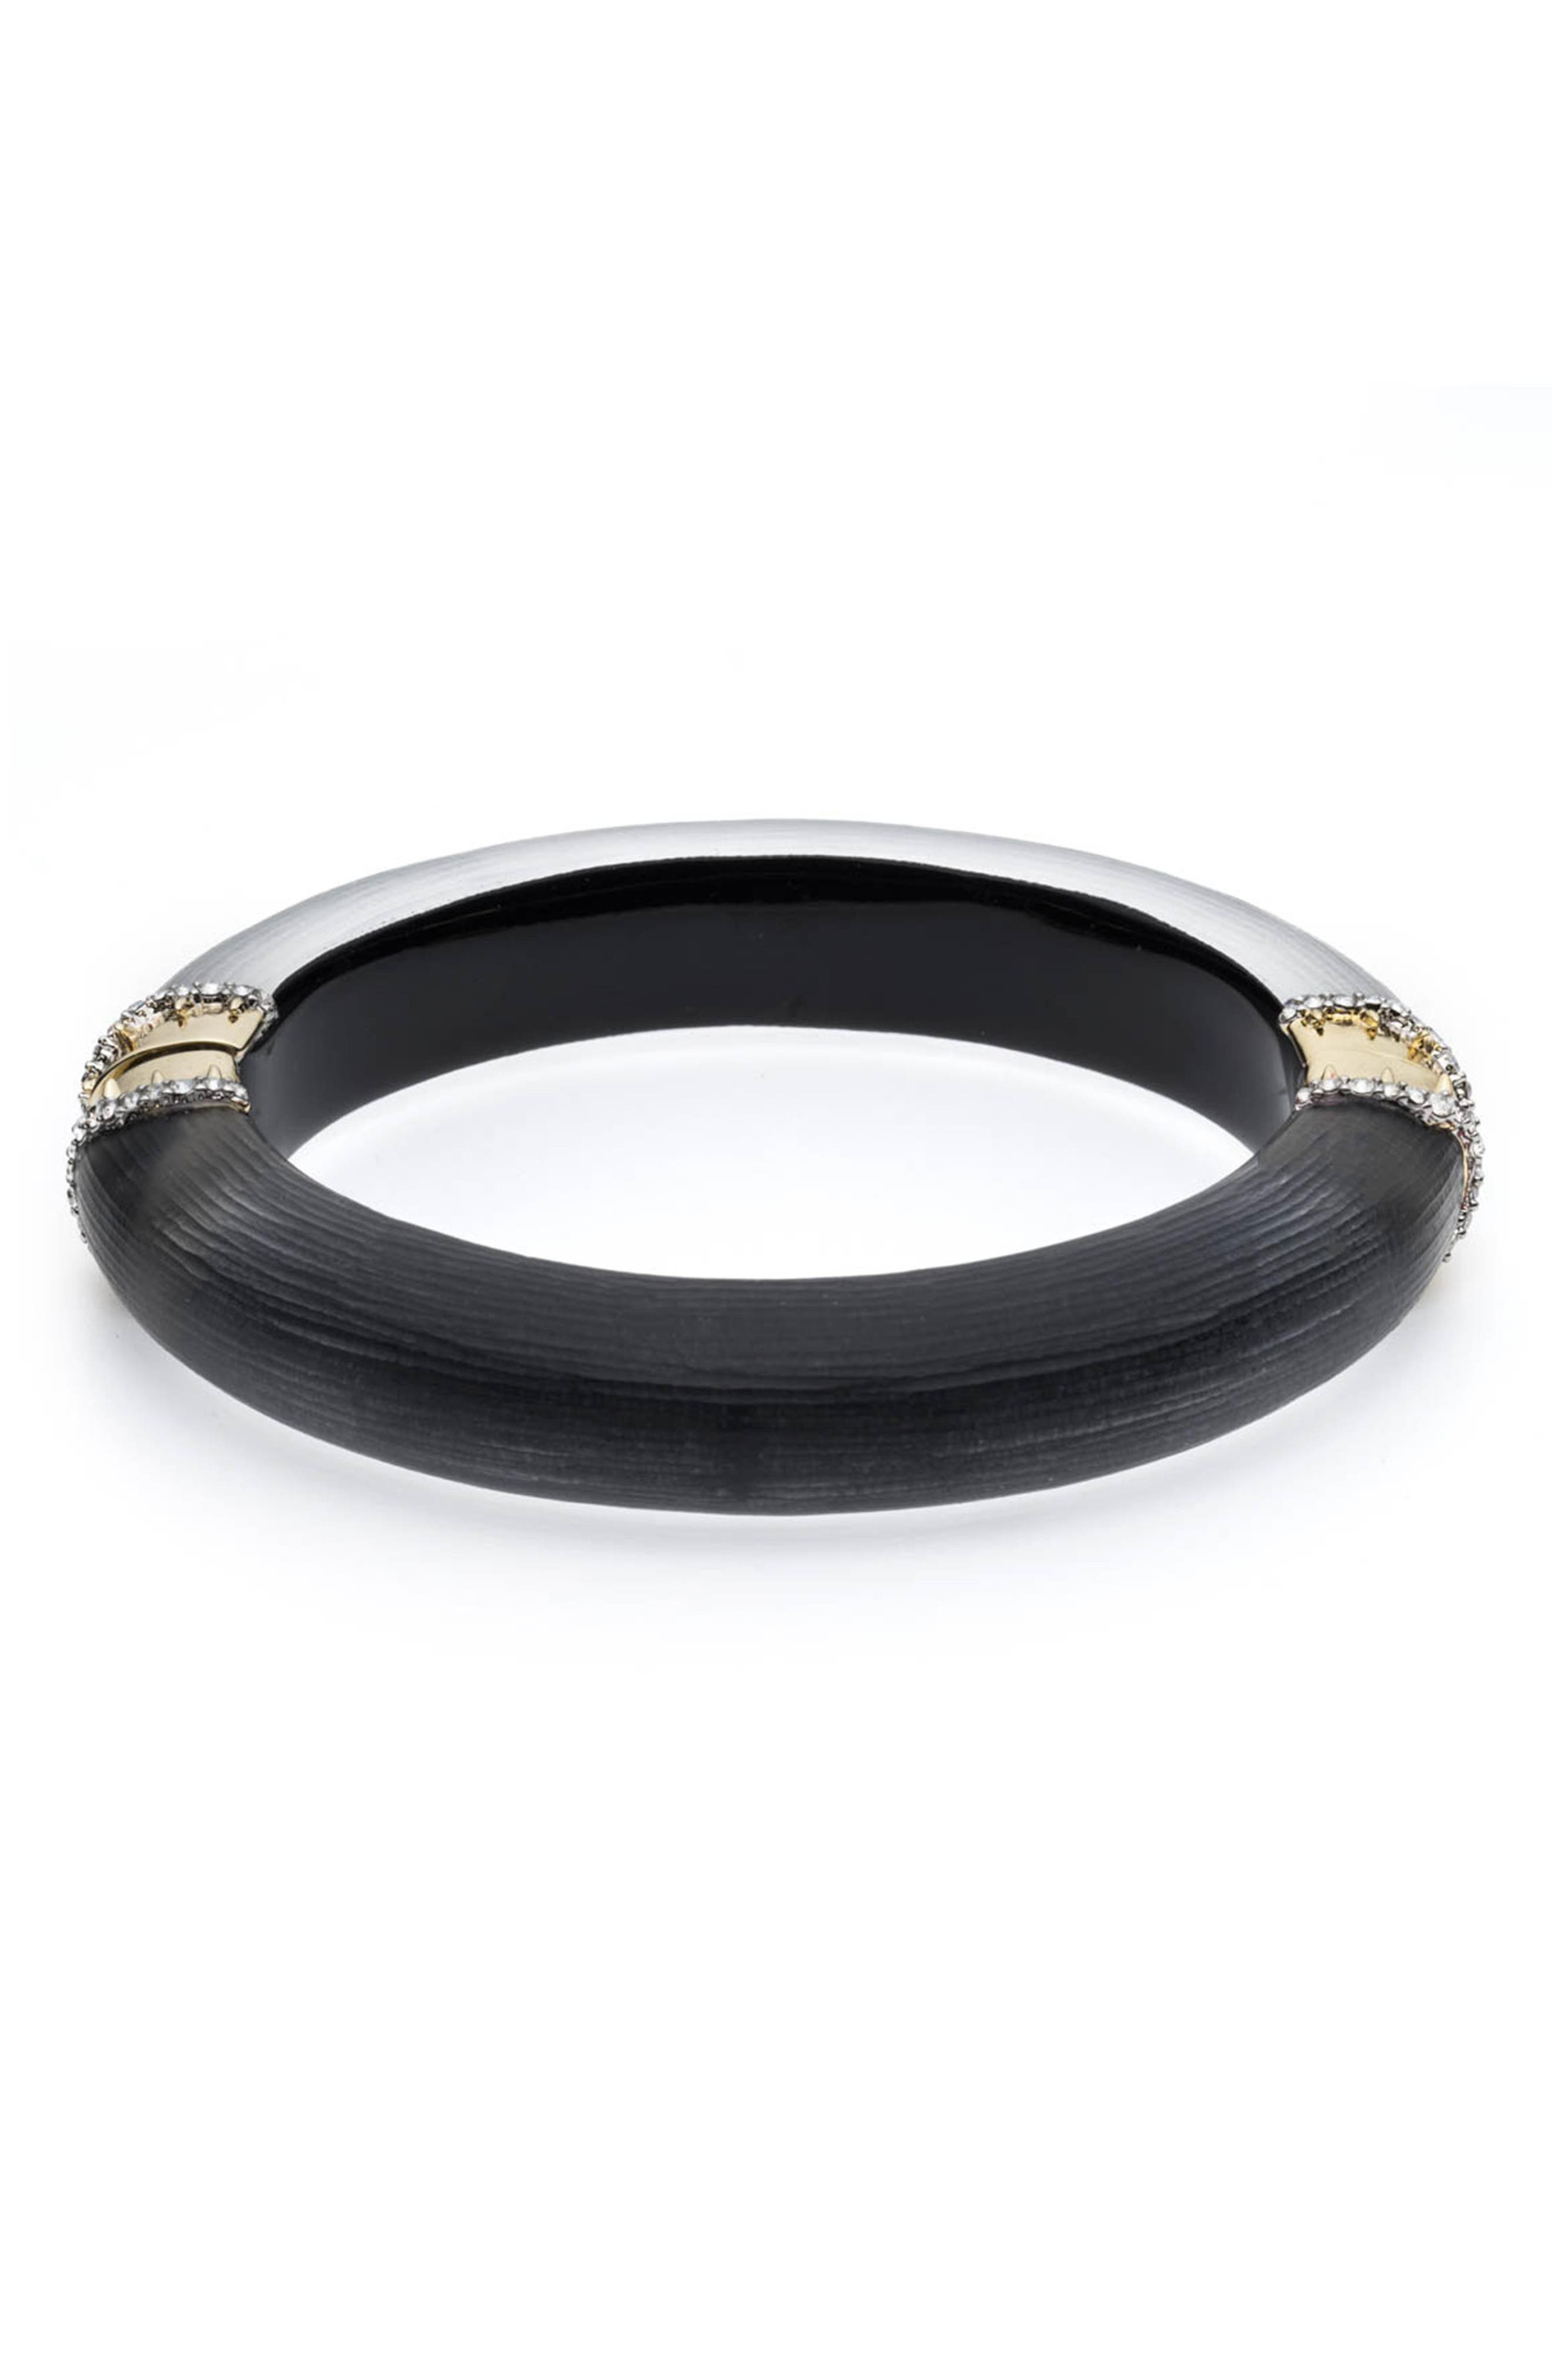 ALEXIS BITTAR Alex Bittar Lucite Pave Edge Hinge Bracelet in Black